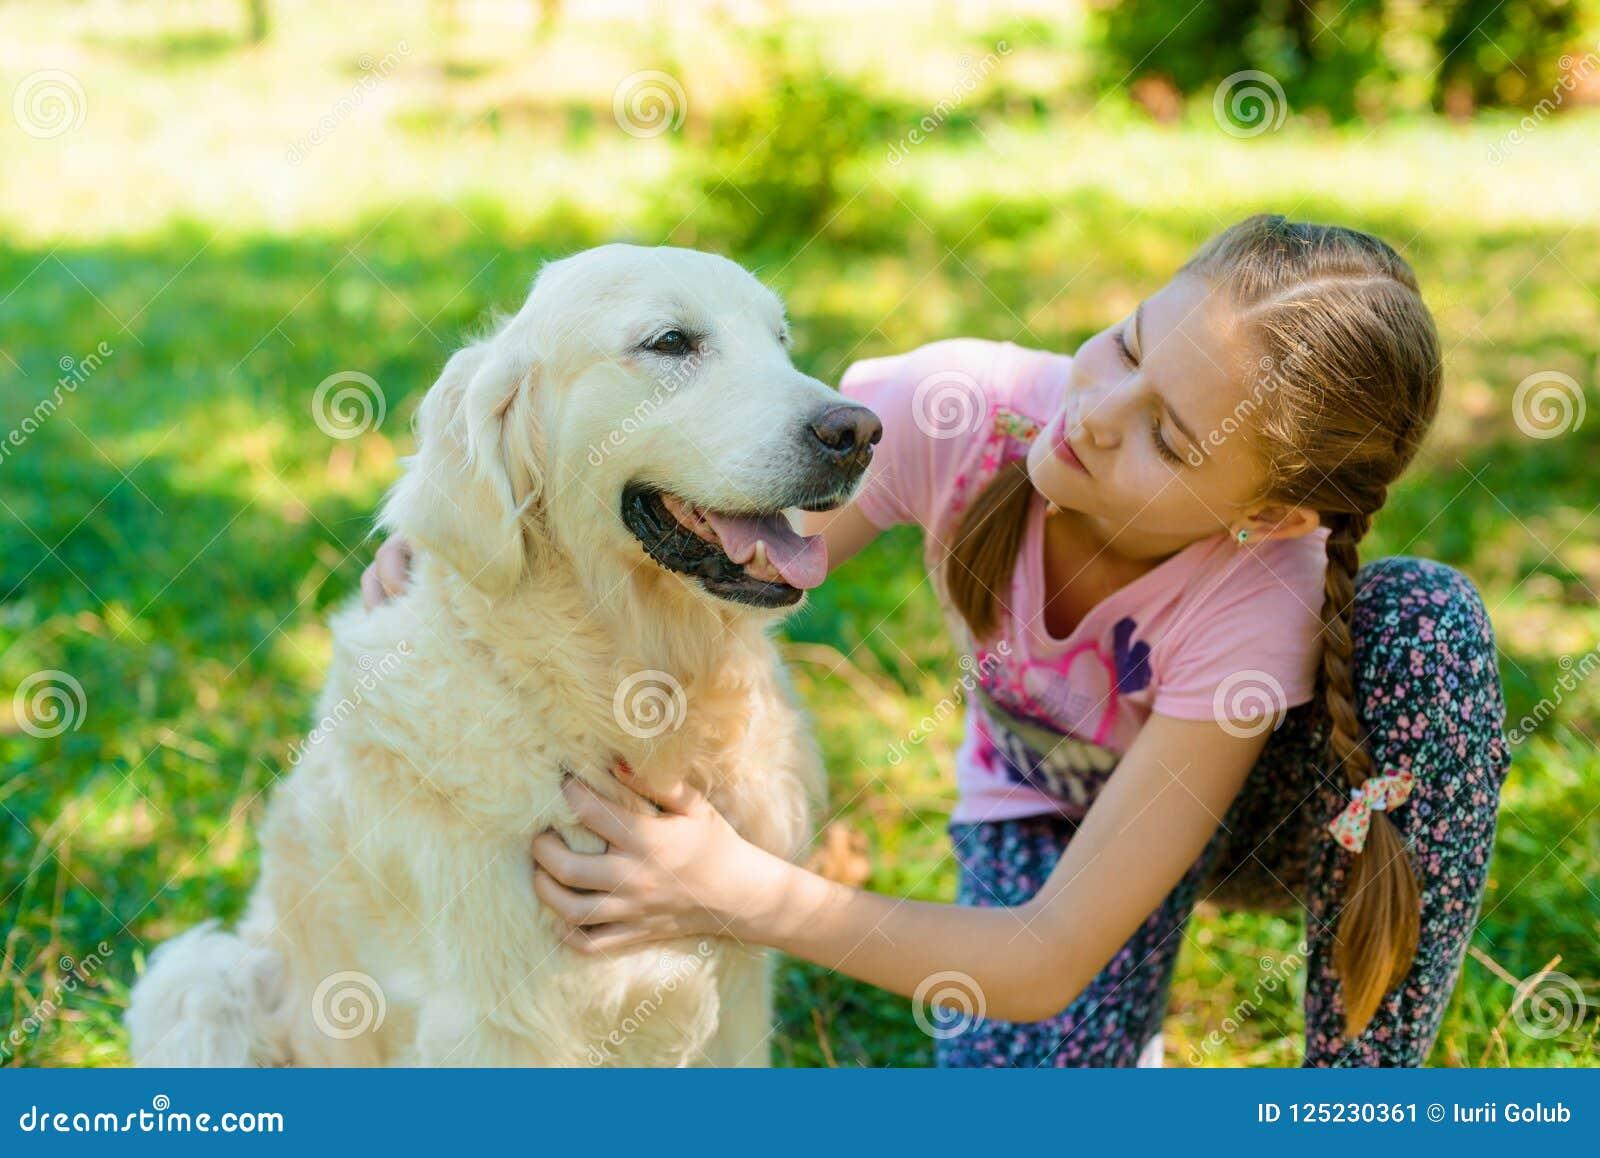 Amour fille avec animal [PUNIQRANDLINE-(au-dating-names.txt) 48